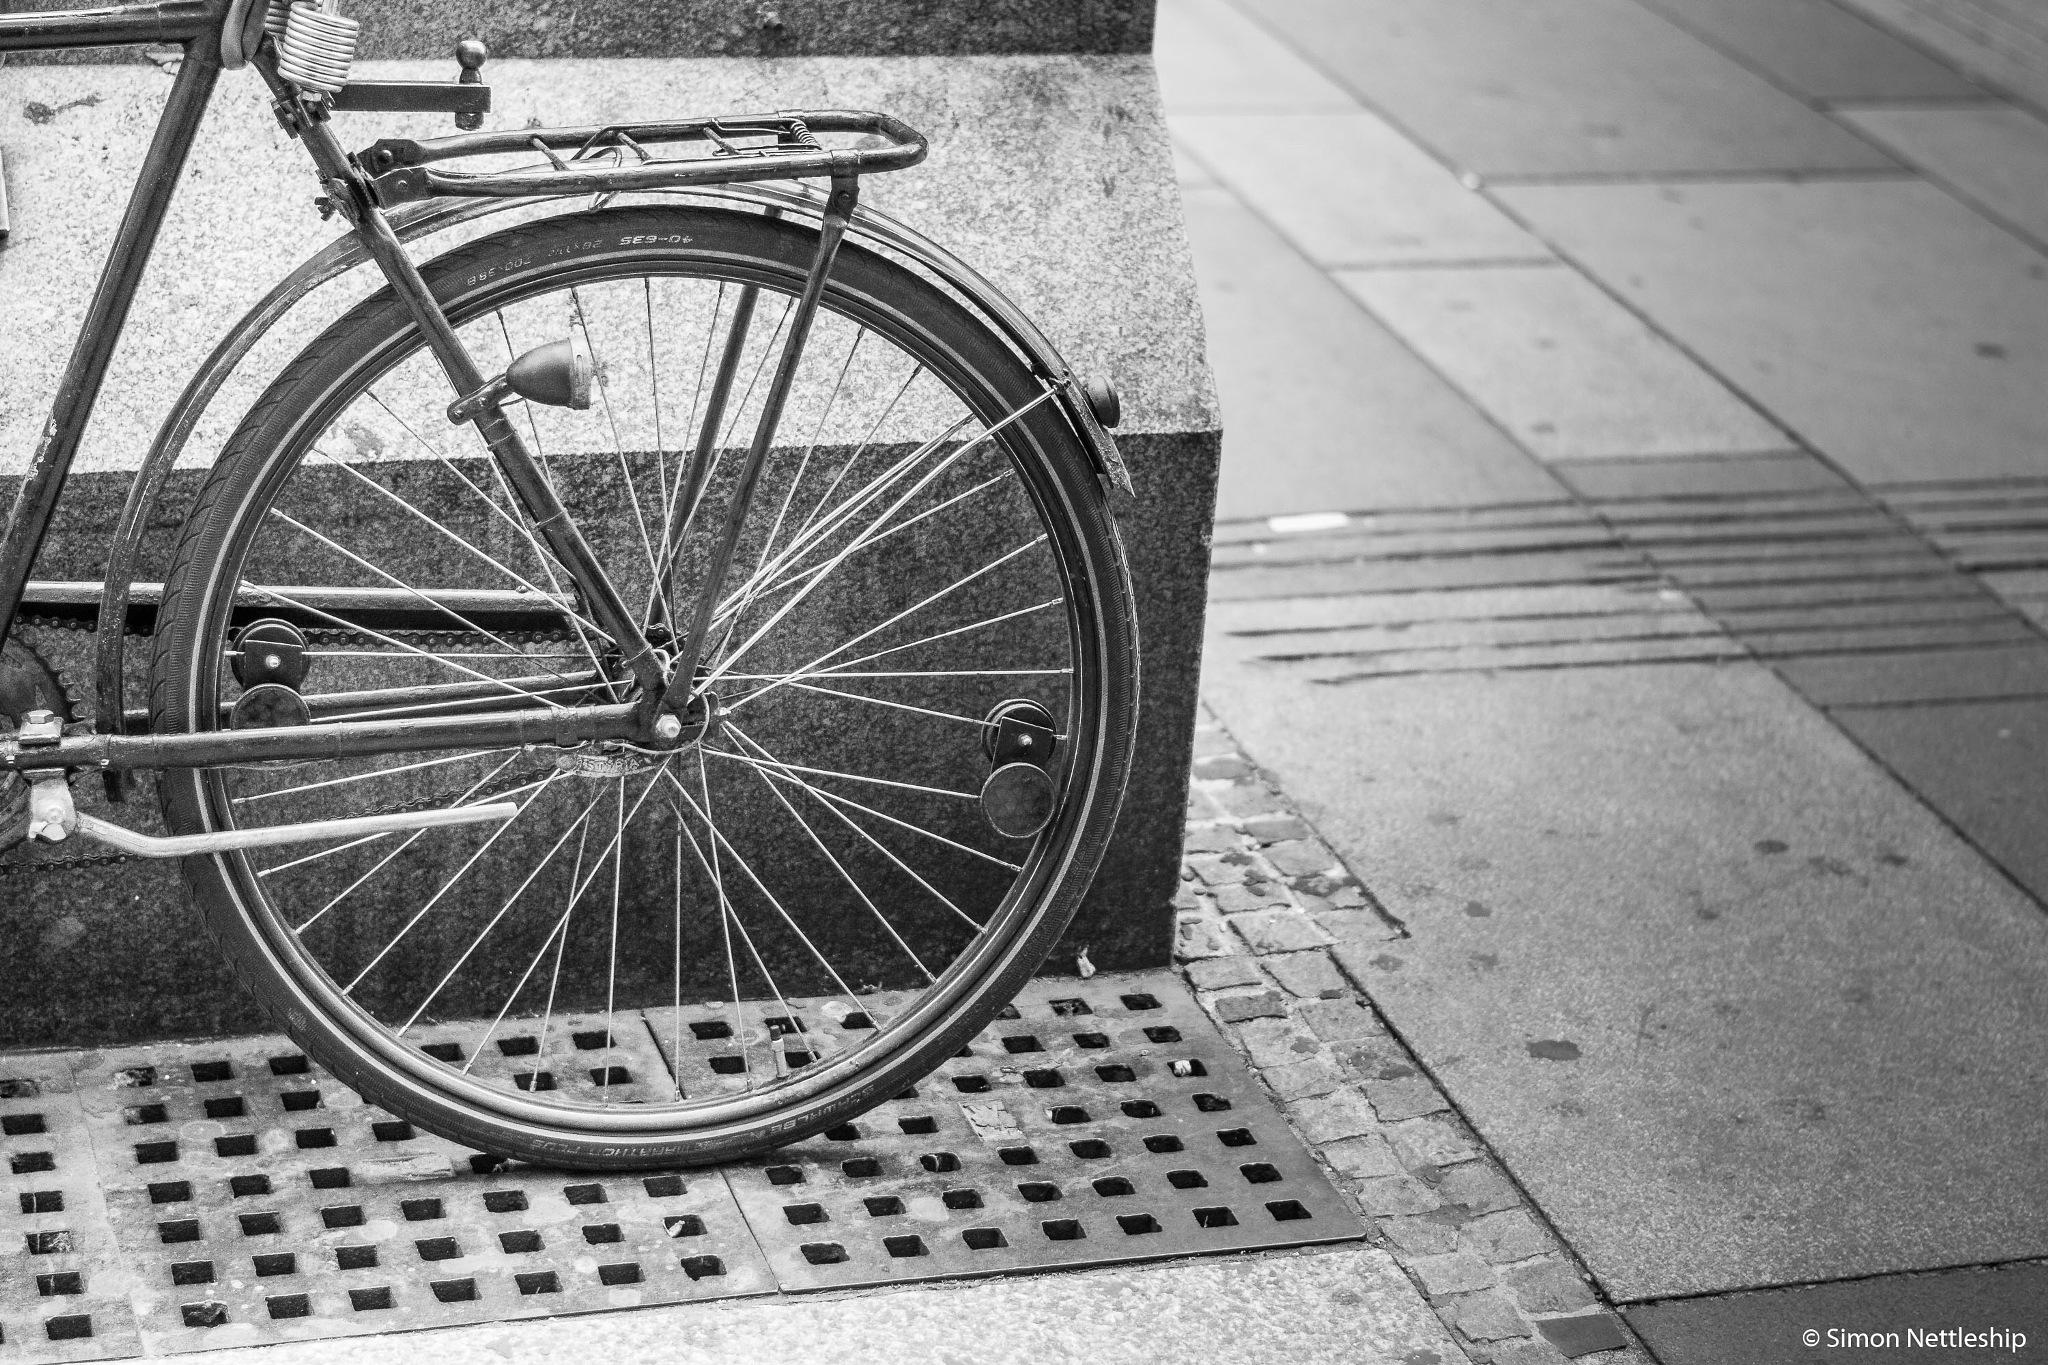 Bike on the street by Simon Nettleship Photography